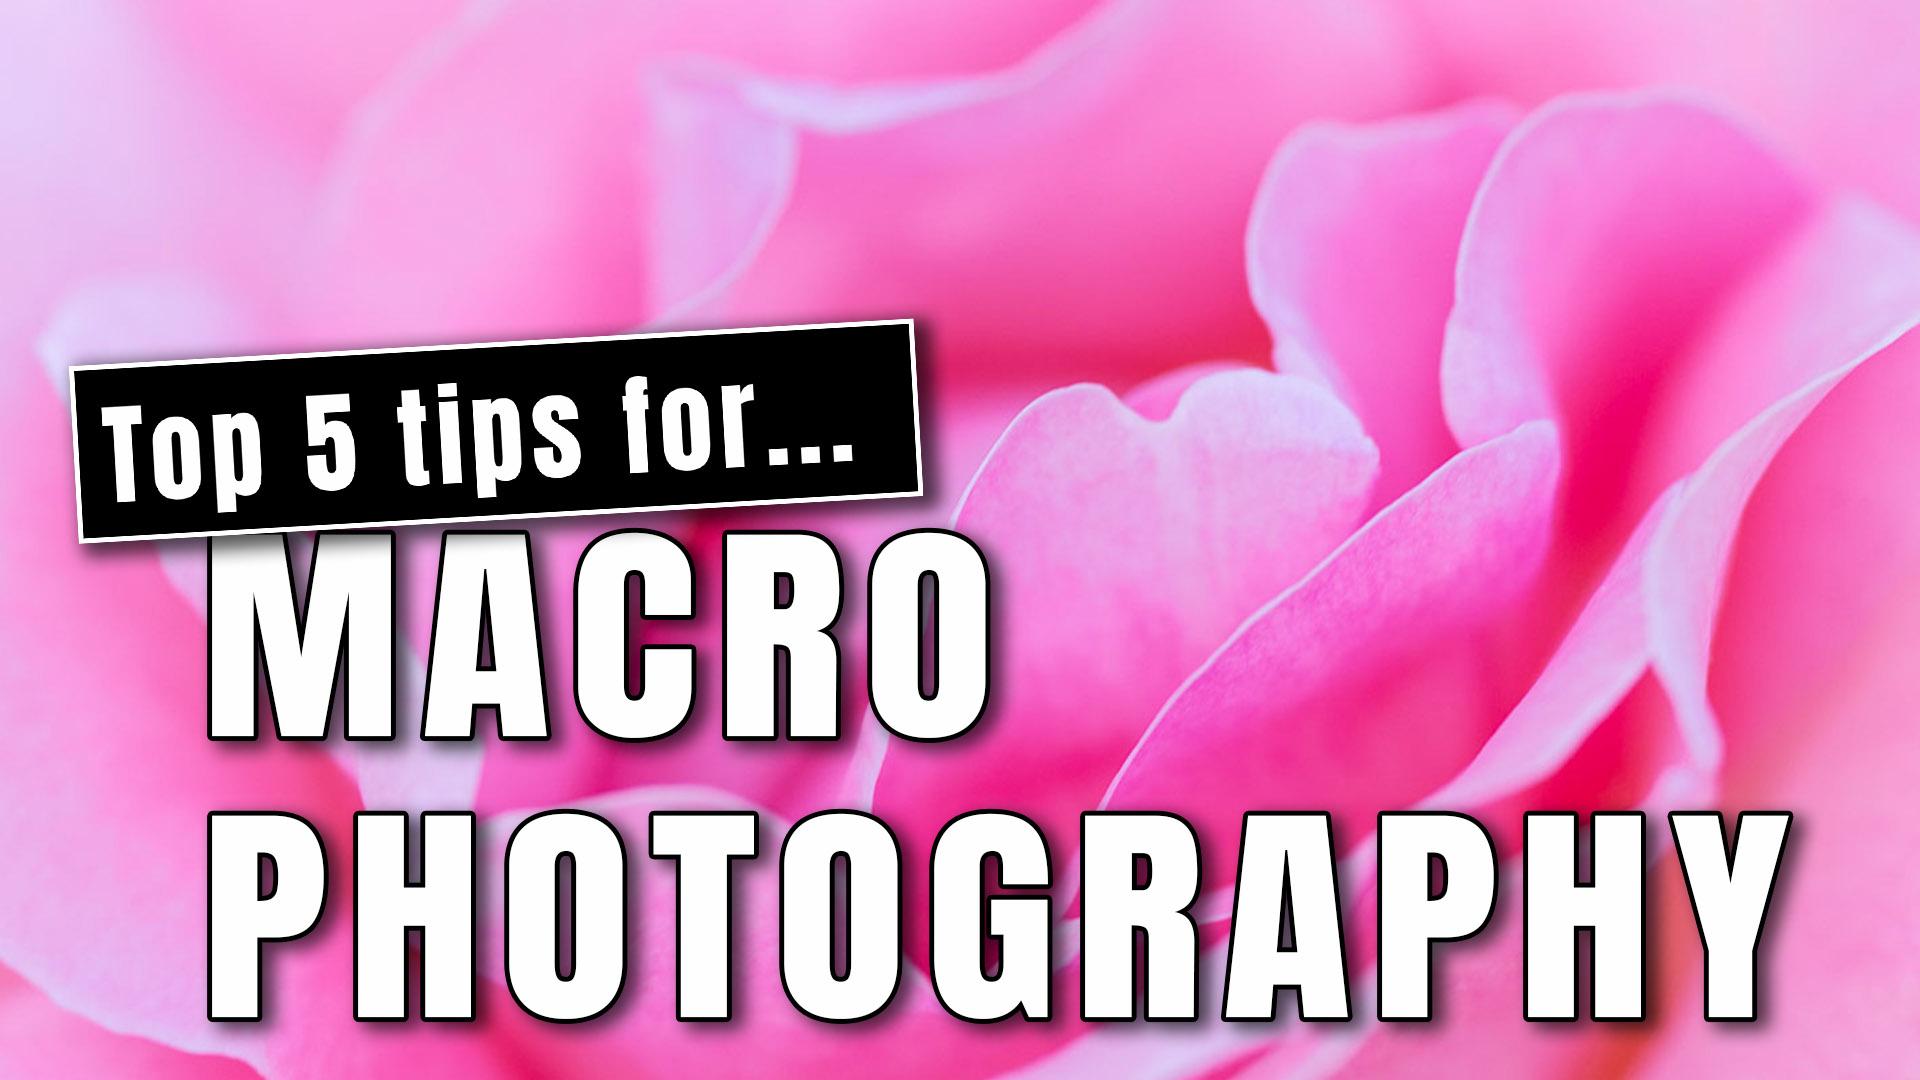 BLOG 5 JUL 2020: Top 5 tips for Macro Photography